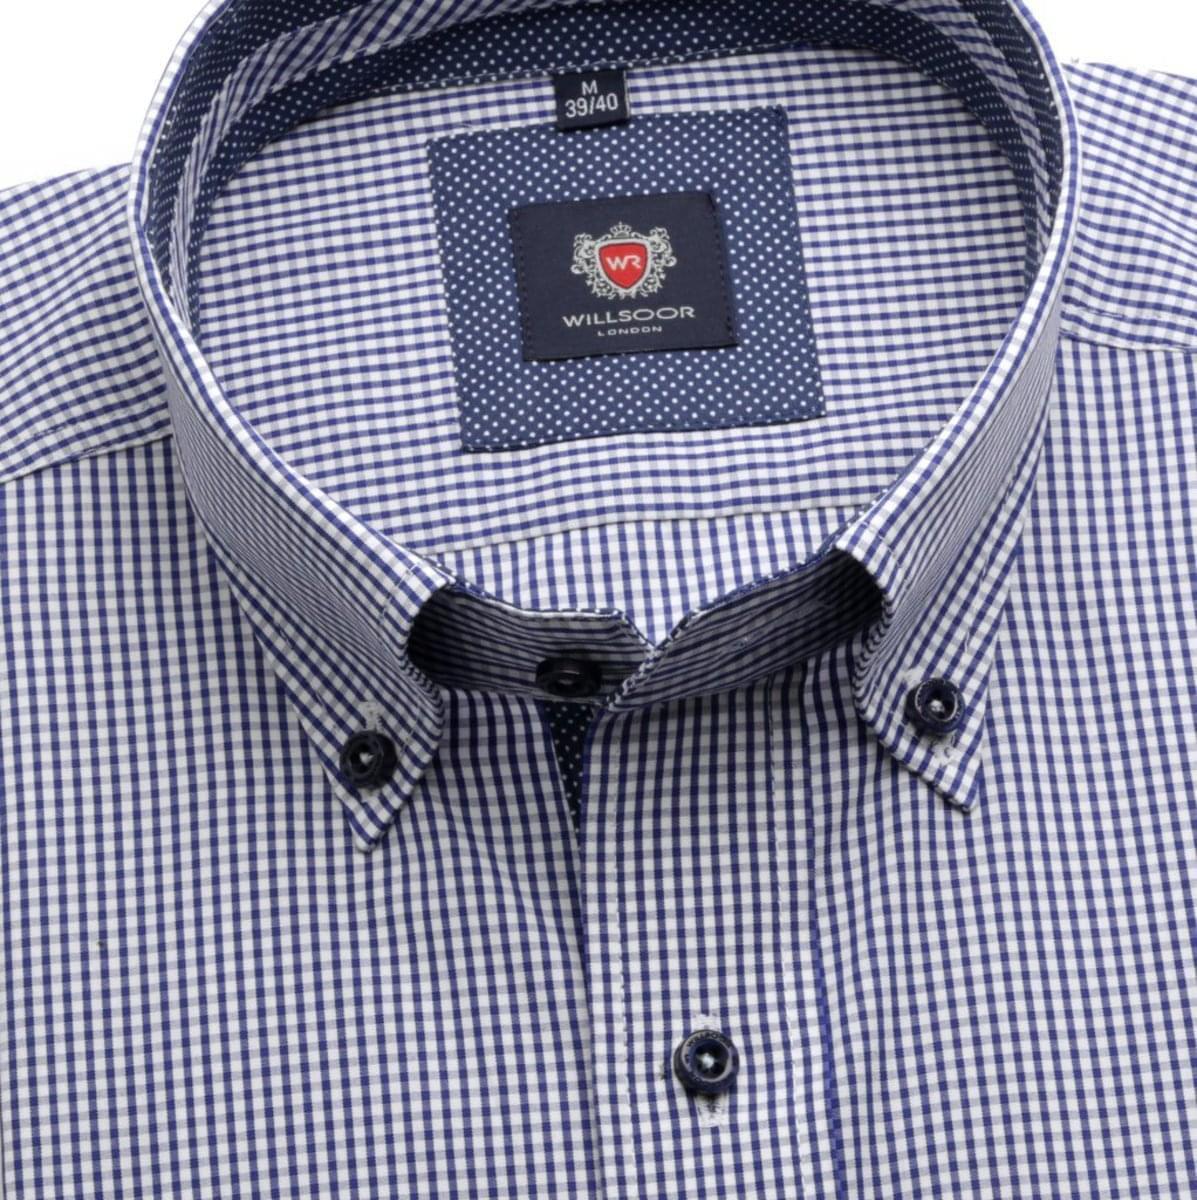 Pánská slim fit košile London (výška 188-194) 6076 s bílo-modrou kostkou a formulí Easy Care 188-194 / M (39/40)